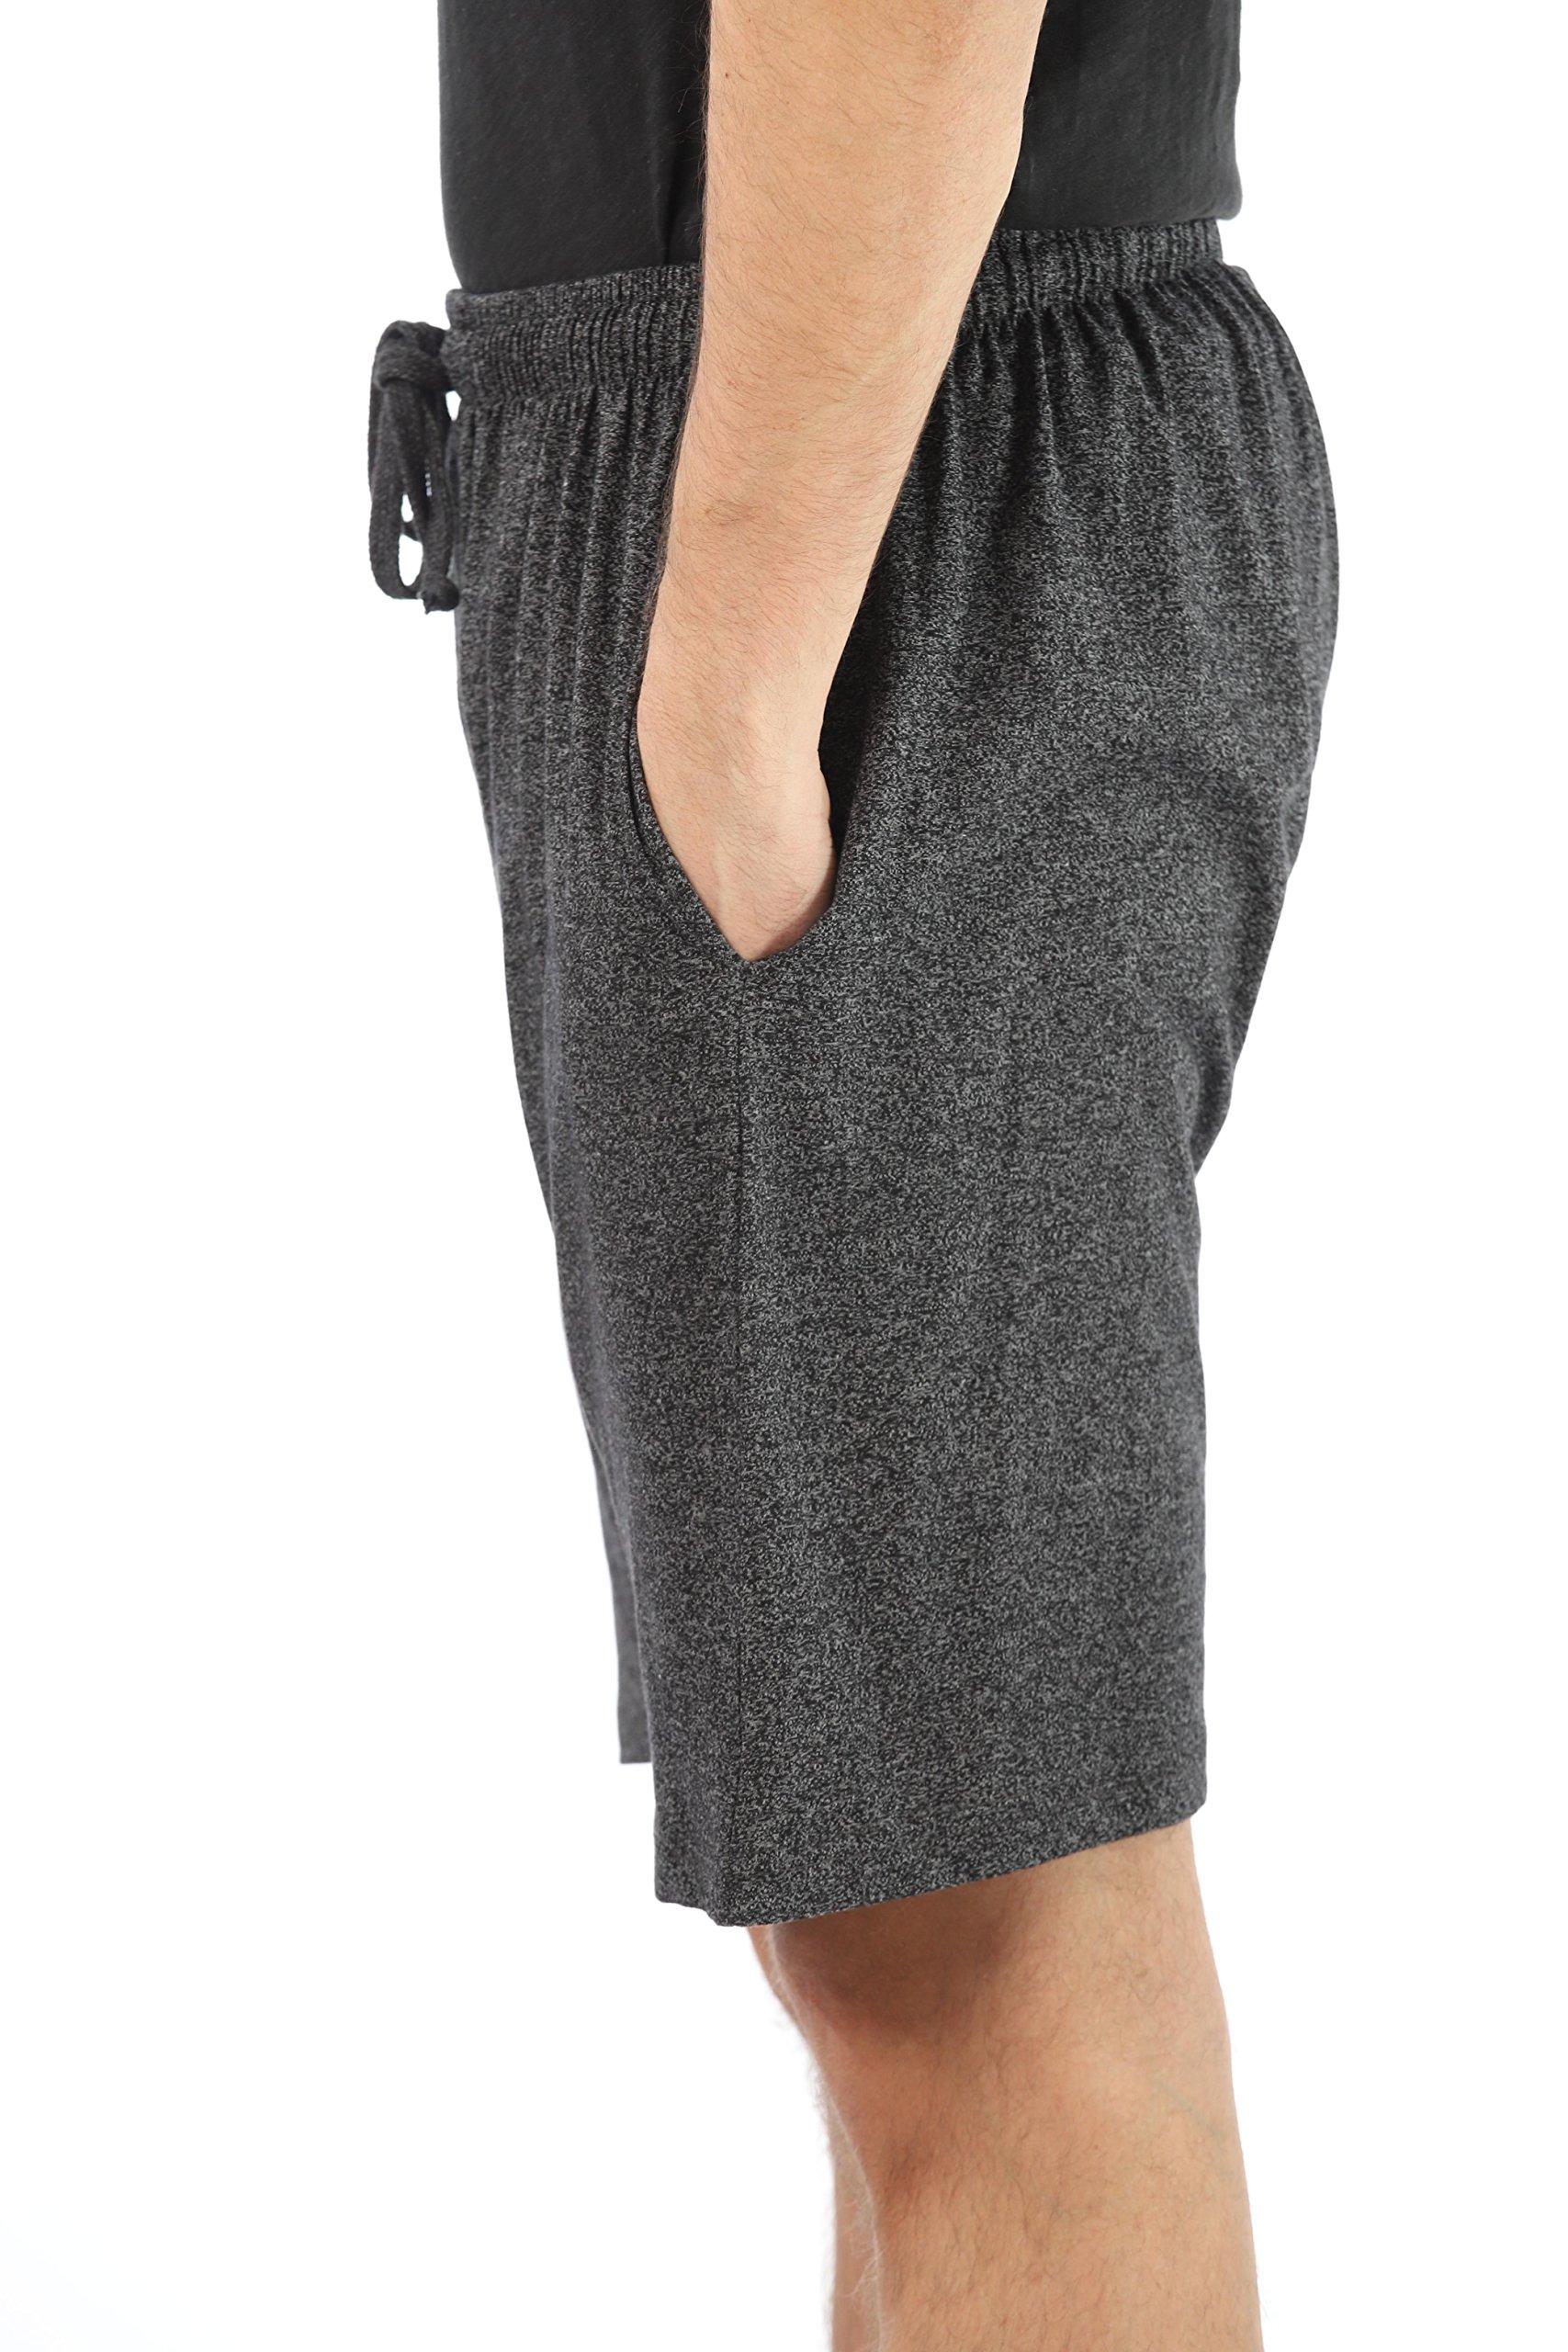 At The Buzzer Men's Pajama Shorts Sleepwear PJS 14504-BLK-L by At The Buzzer (Image #2)